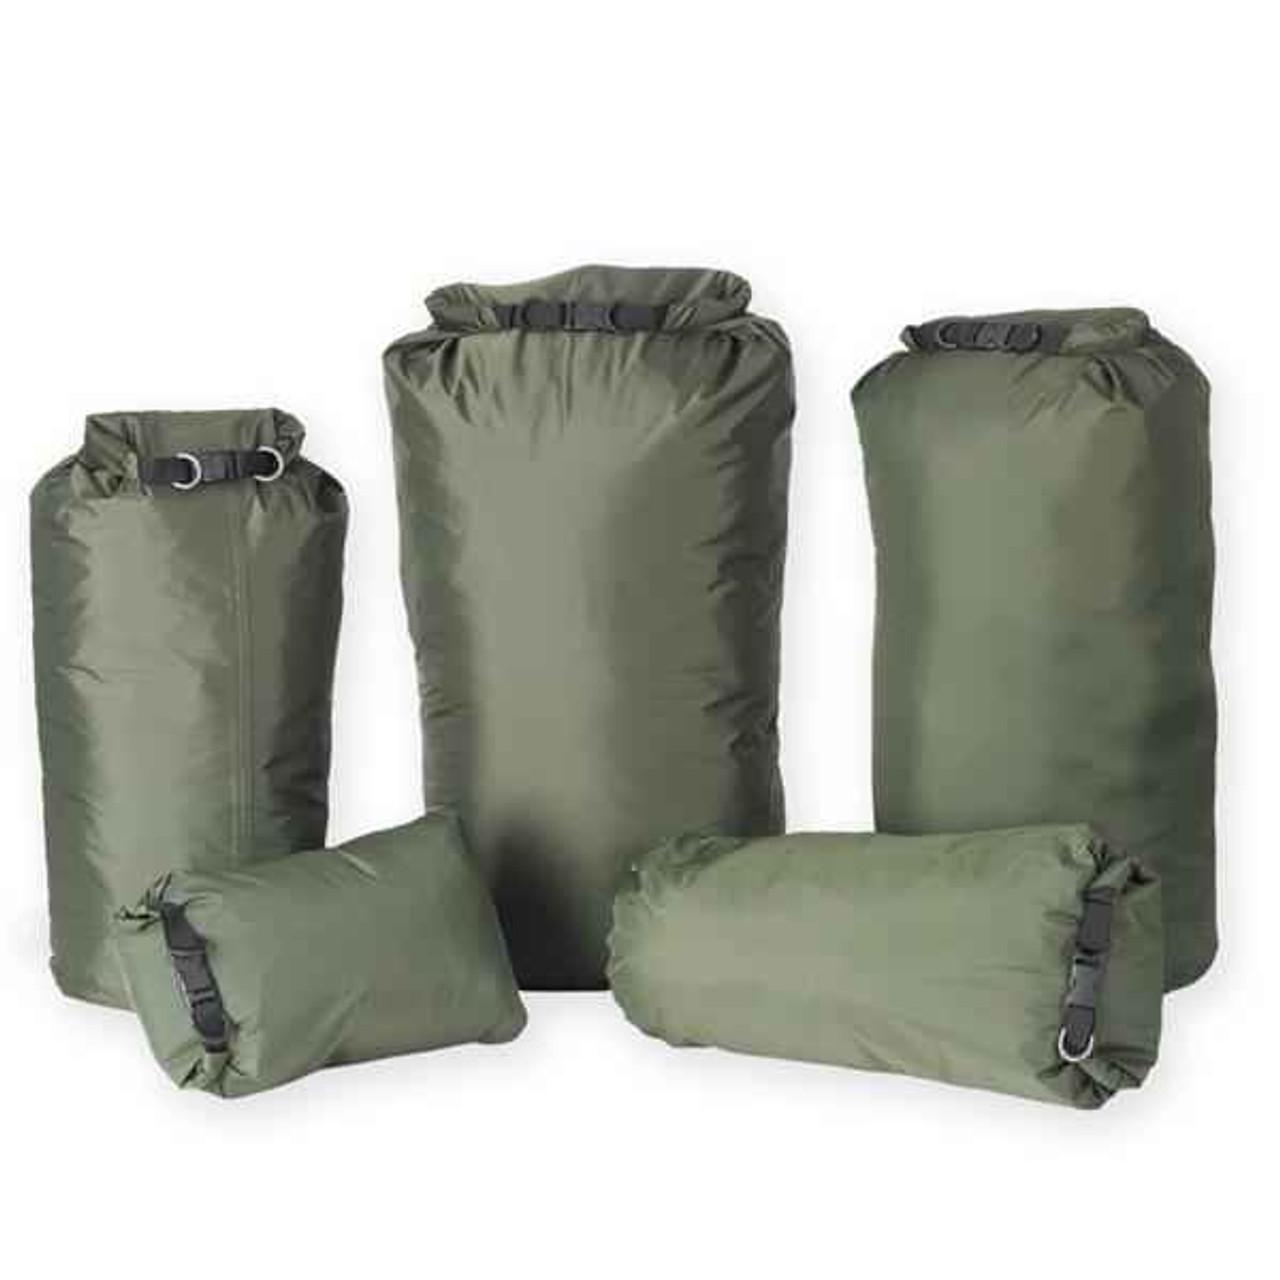 Pro Force Dri-Sak Waterproof Bag - XX Large, Olive